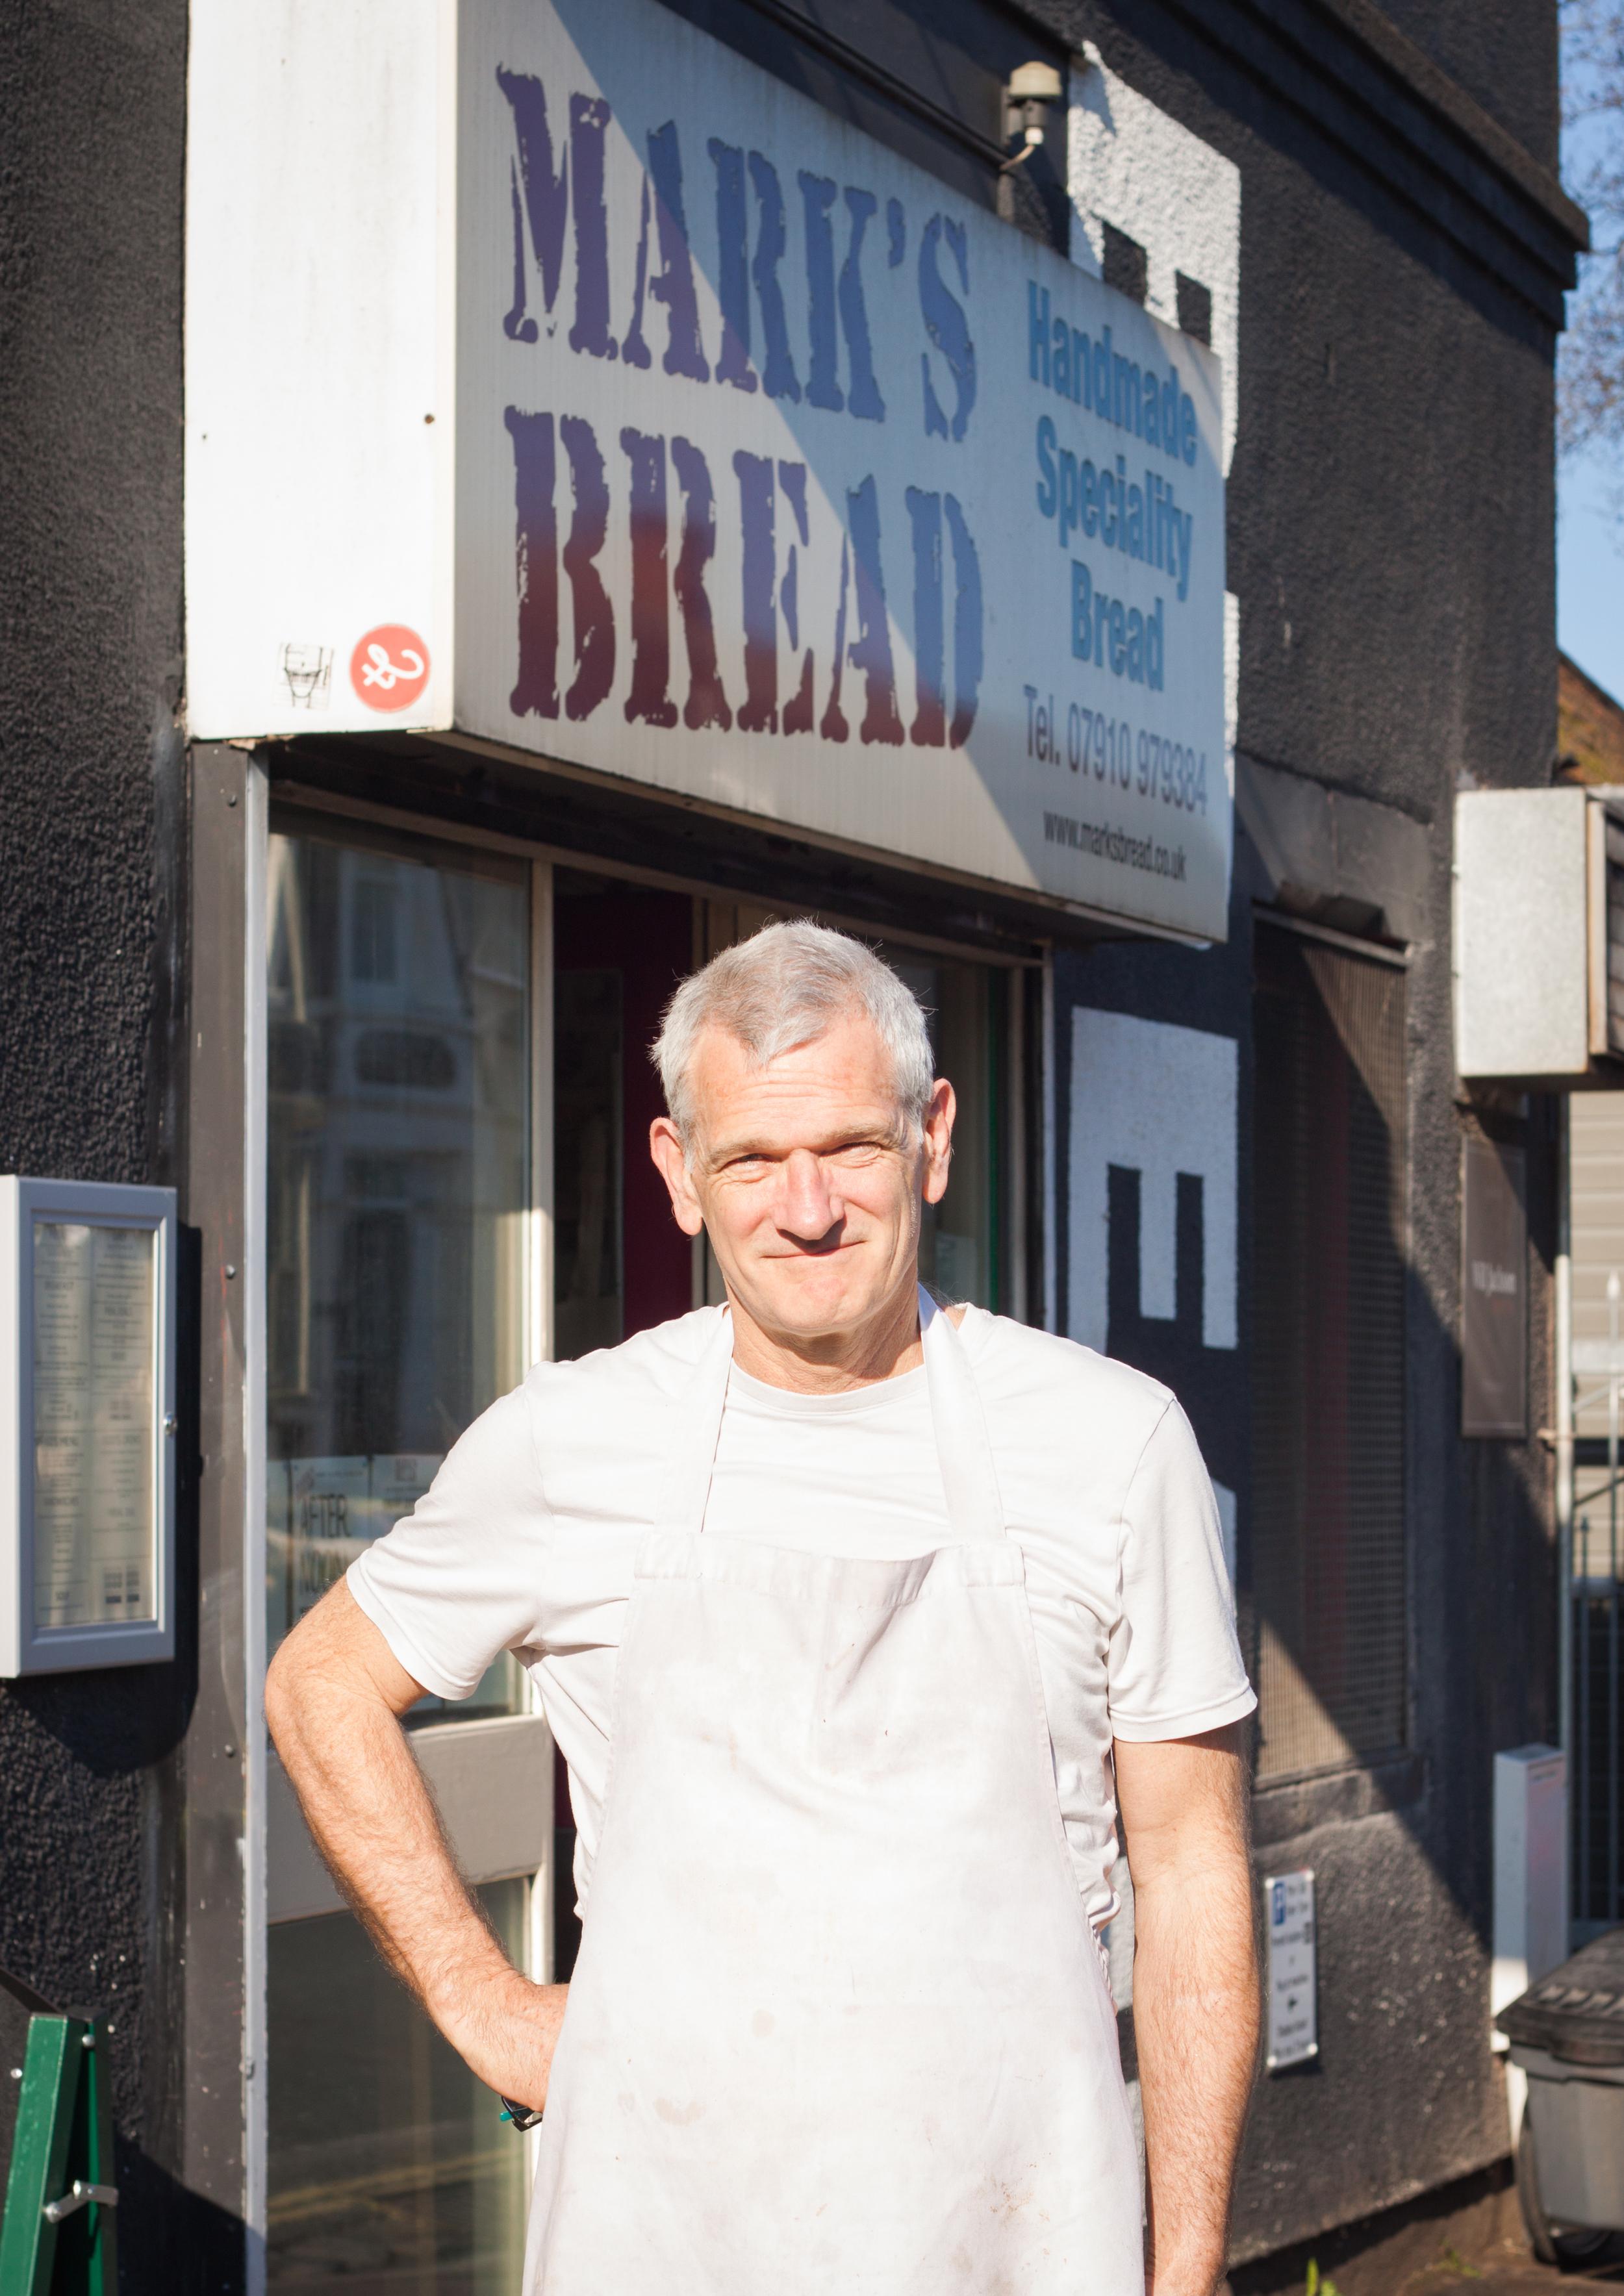 Mark Newman - Mark's Bread